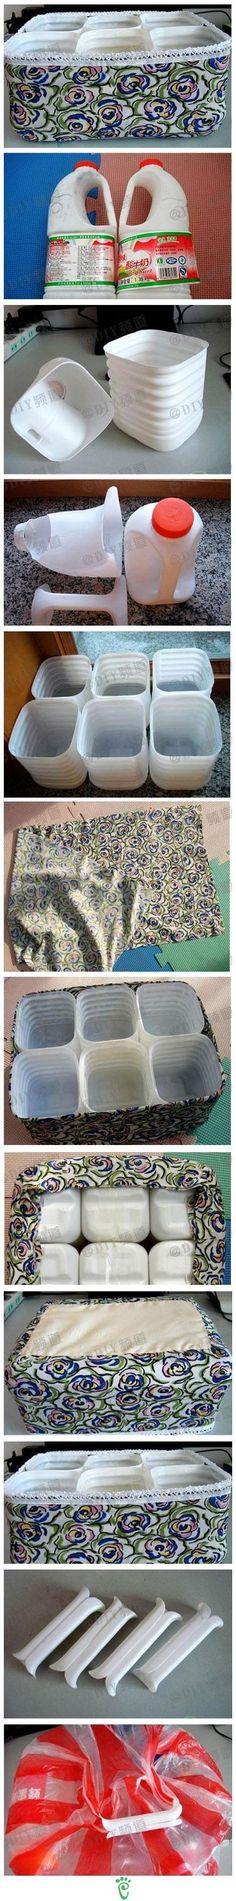 bos-deterjan-kutularindan- organizer yapmak